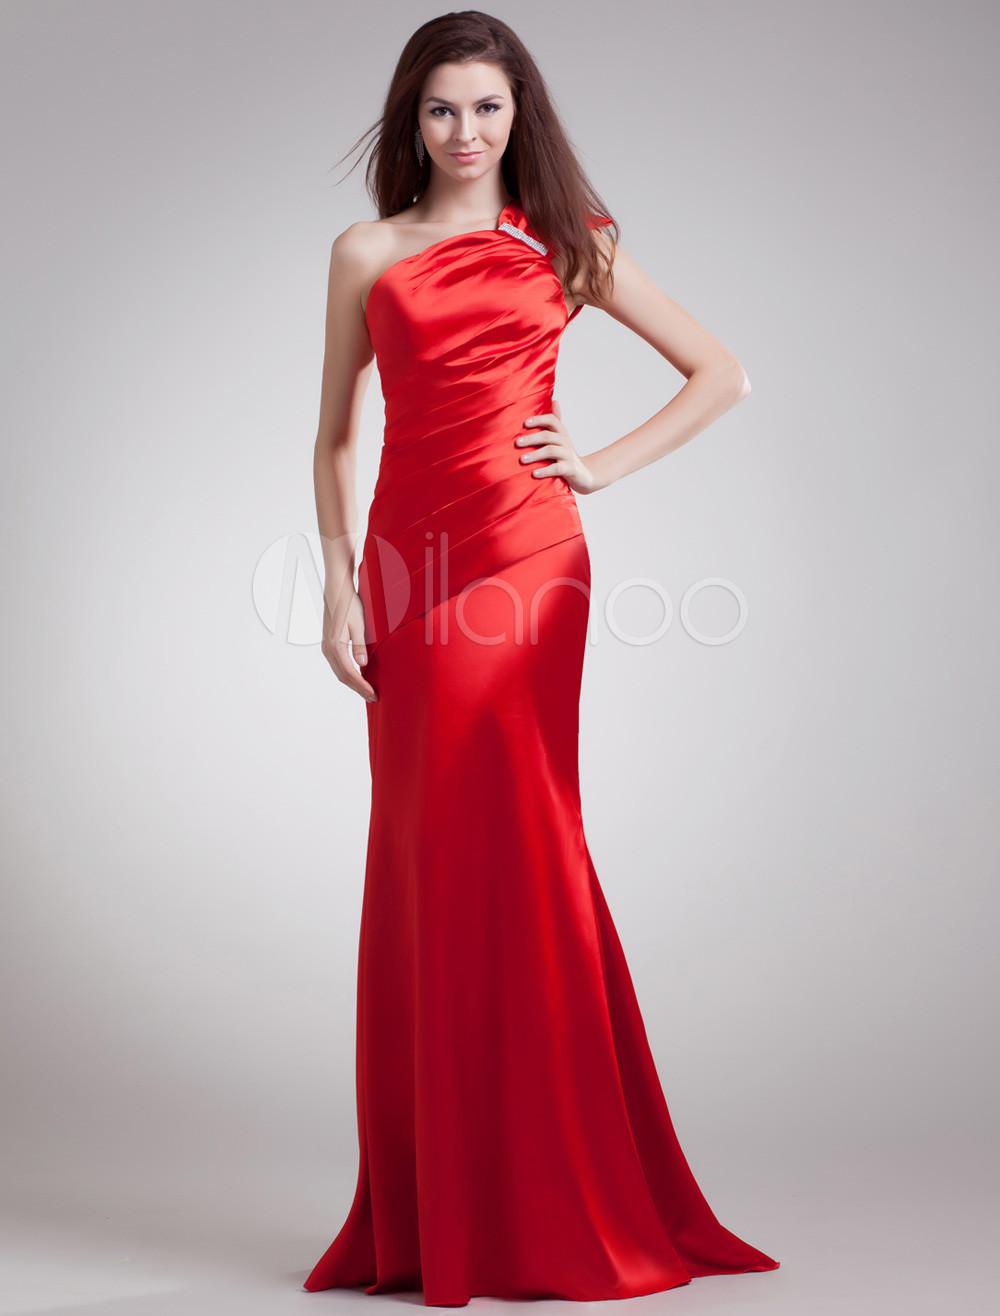 Red Sheath Rhinestone One-Shoulder Evening Dress with Grace Court Train (Wedding Evening Dresses) photo